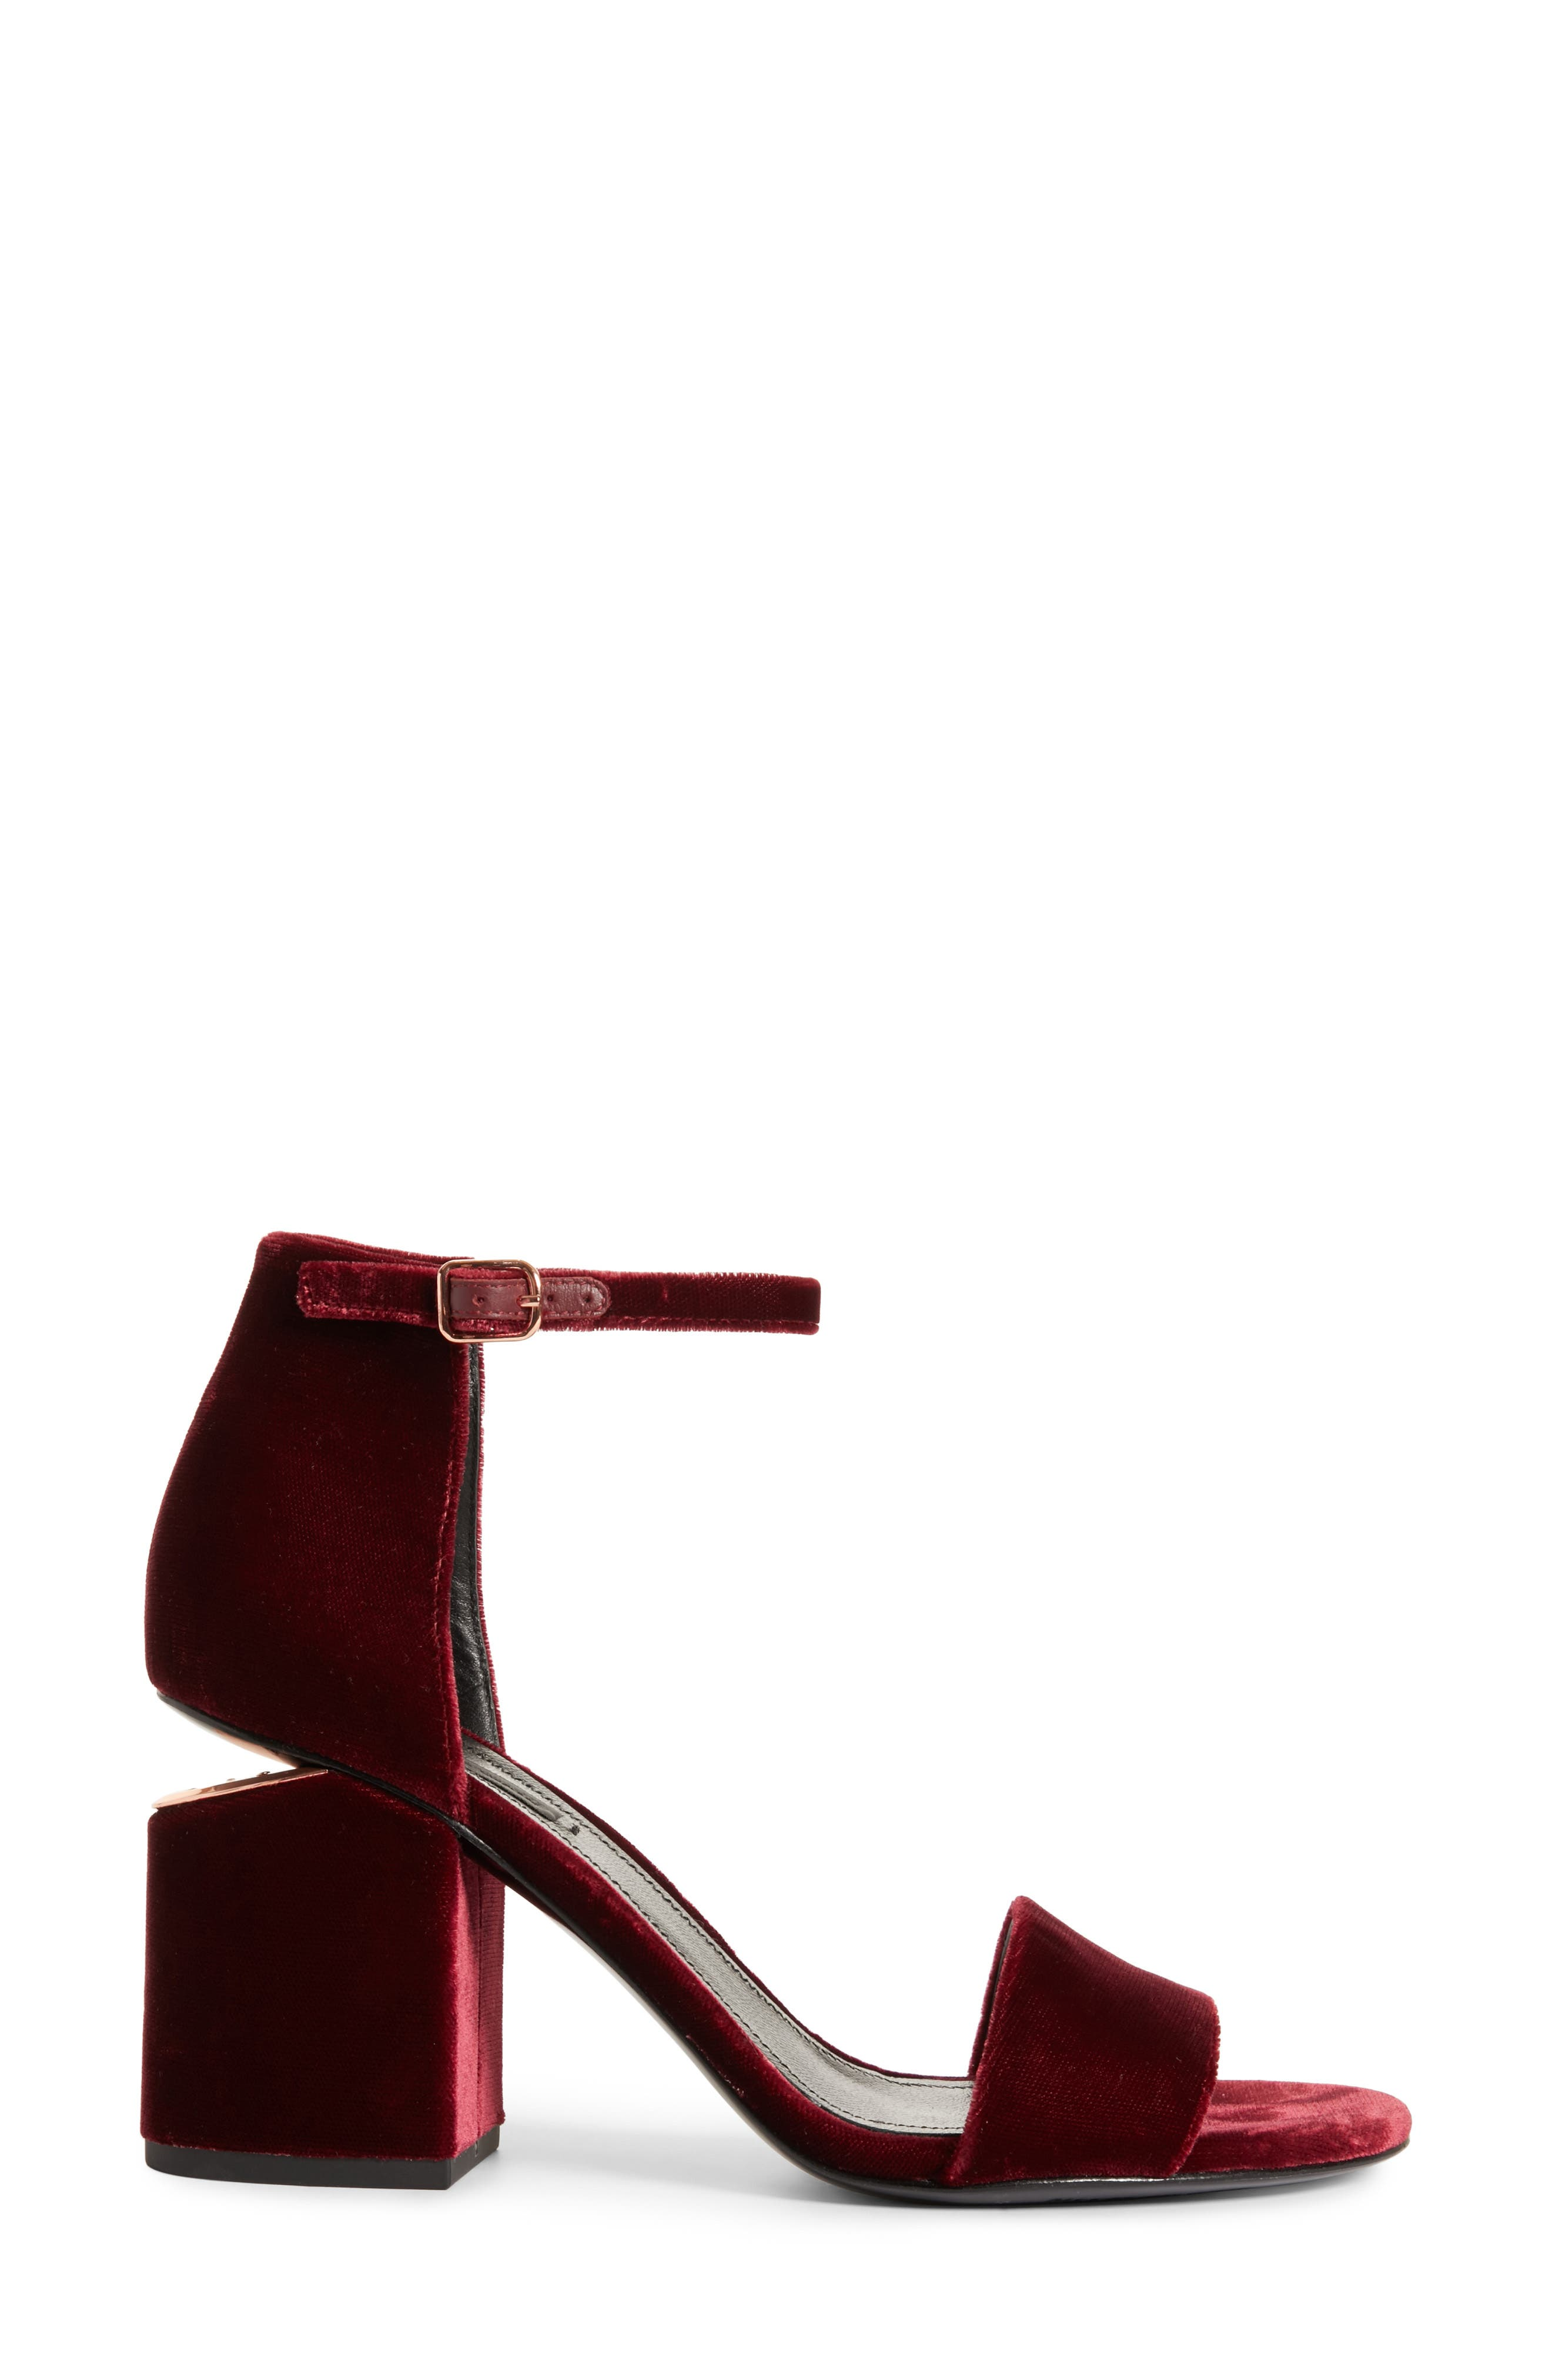 Abby Notch Heel Sandal,                             Alternate thumbnail 3, color,                             930